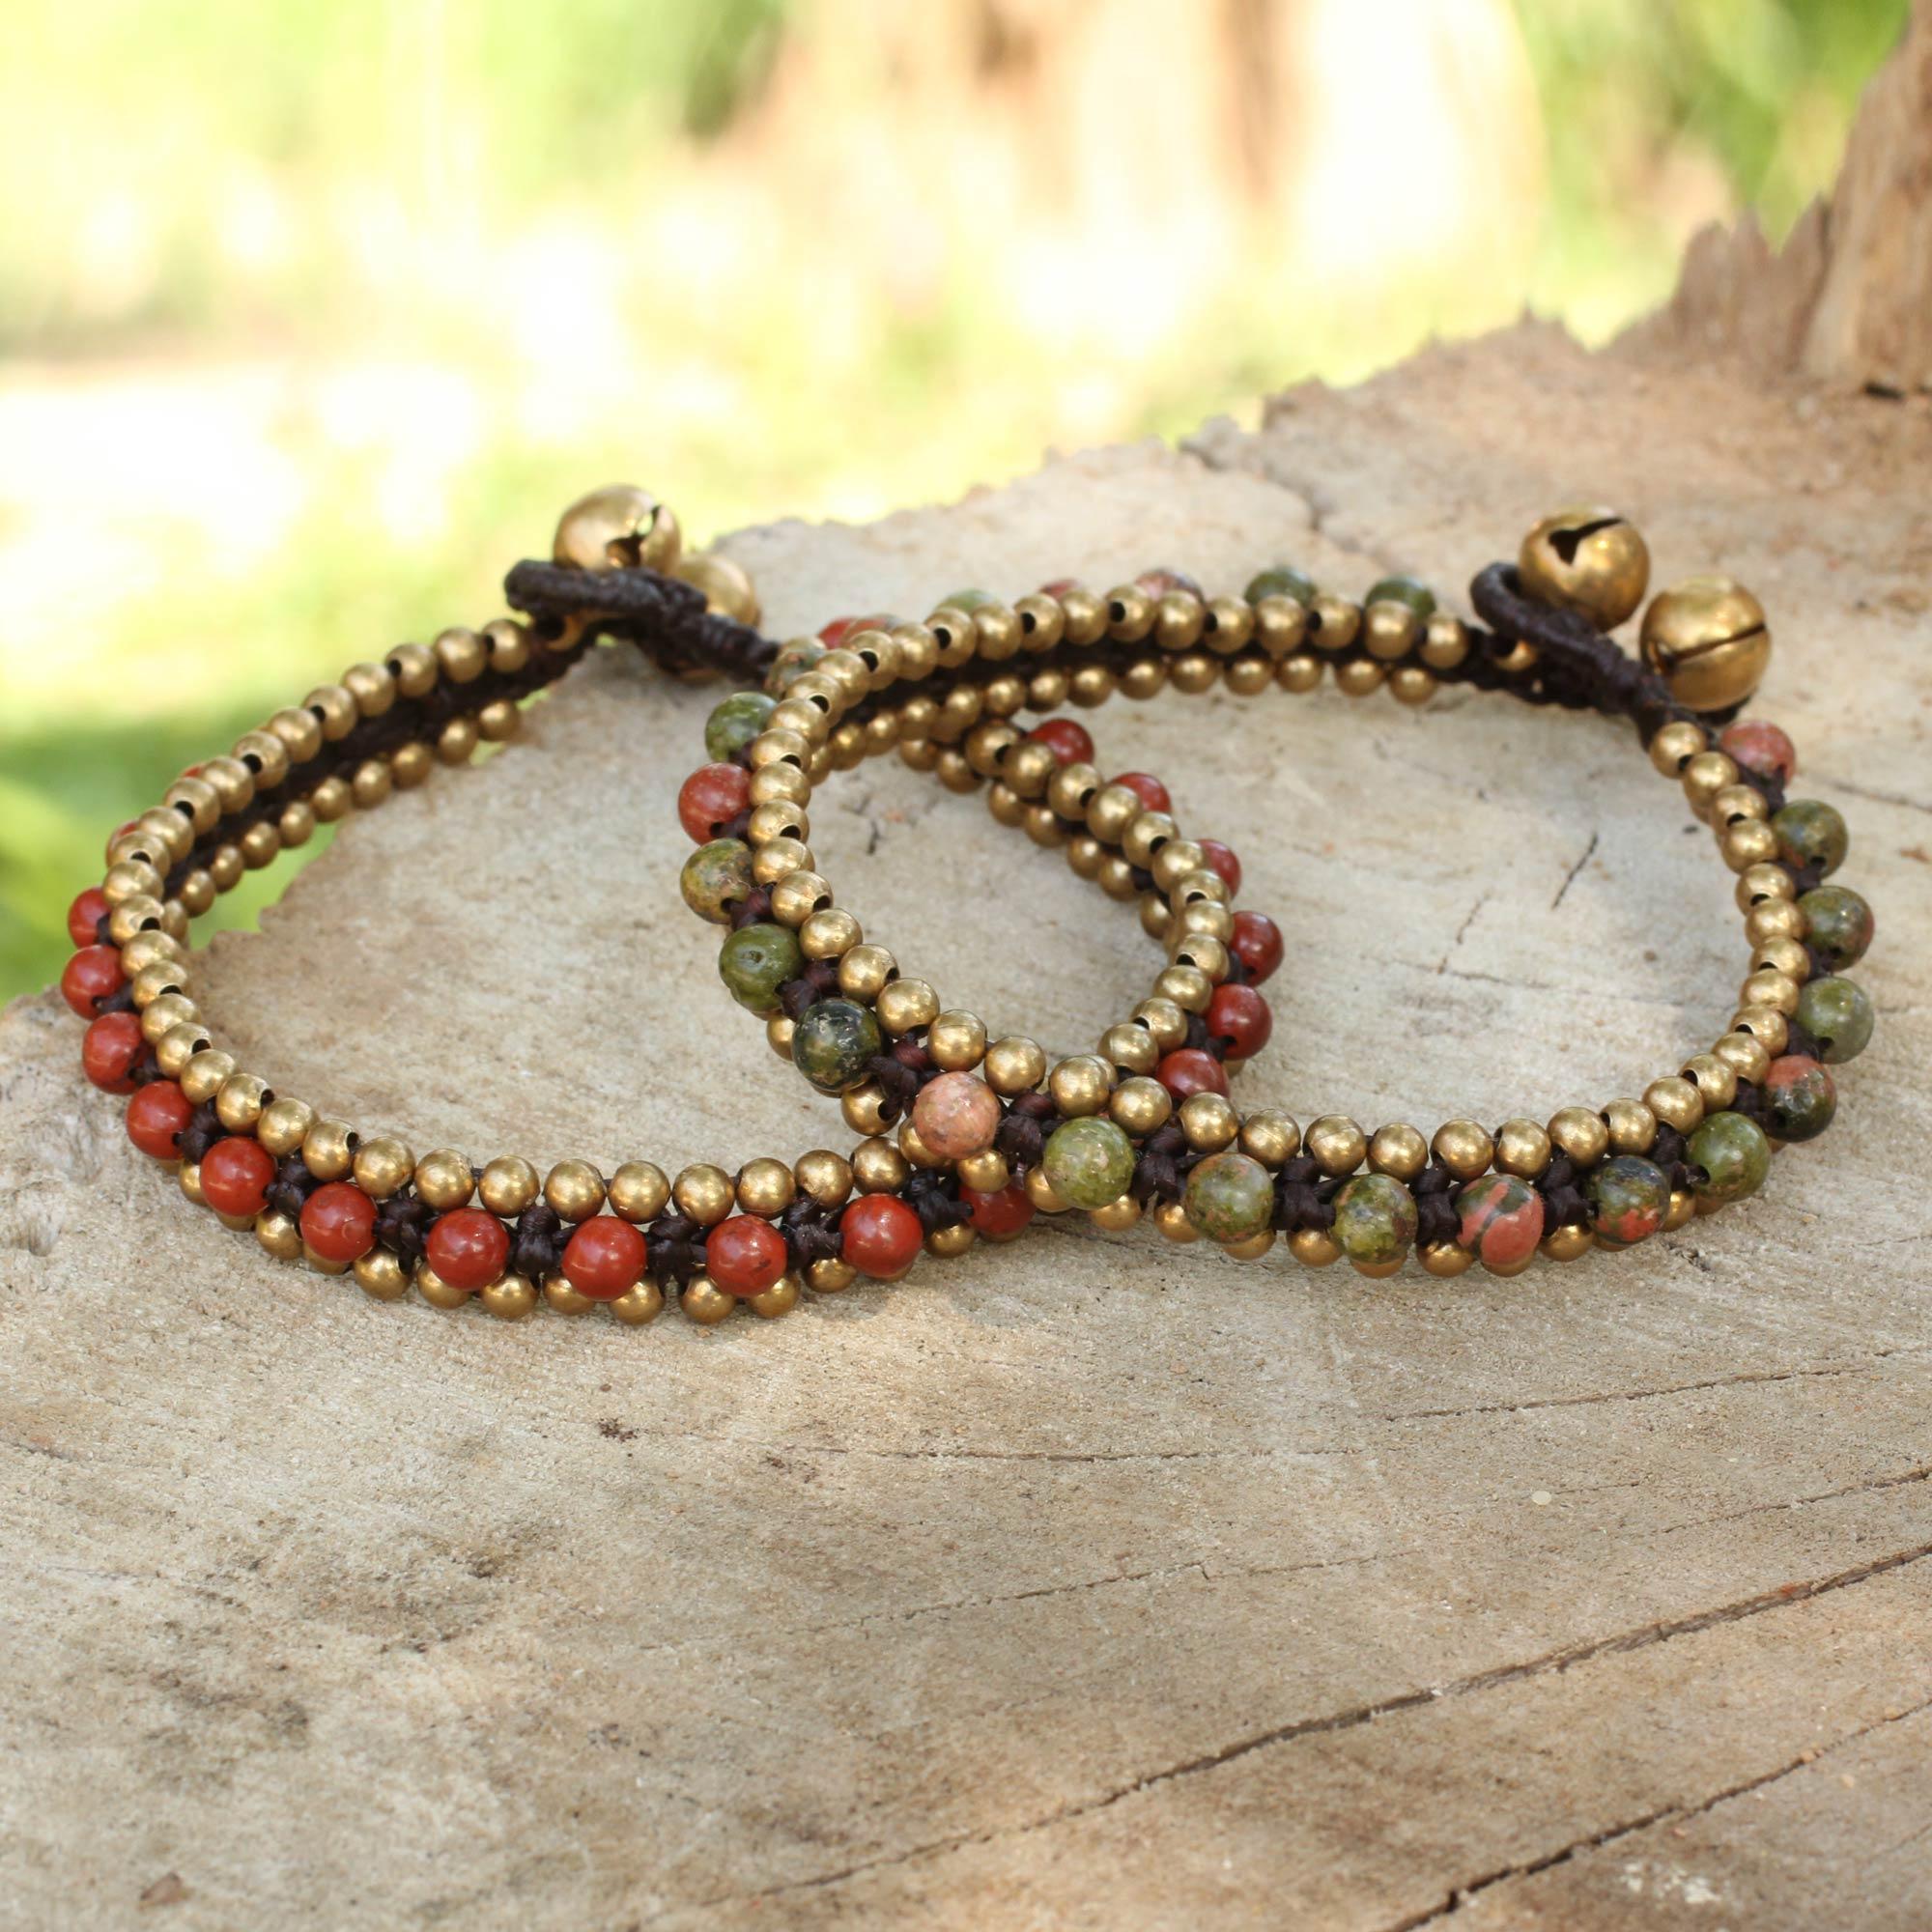 Beaded Fair Trade Bracelets With Jasper